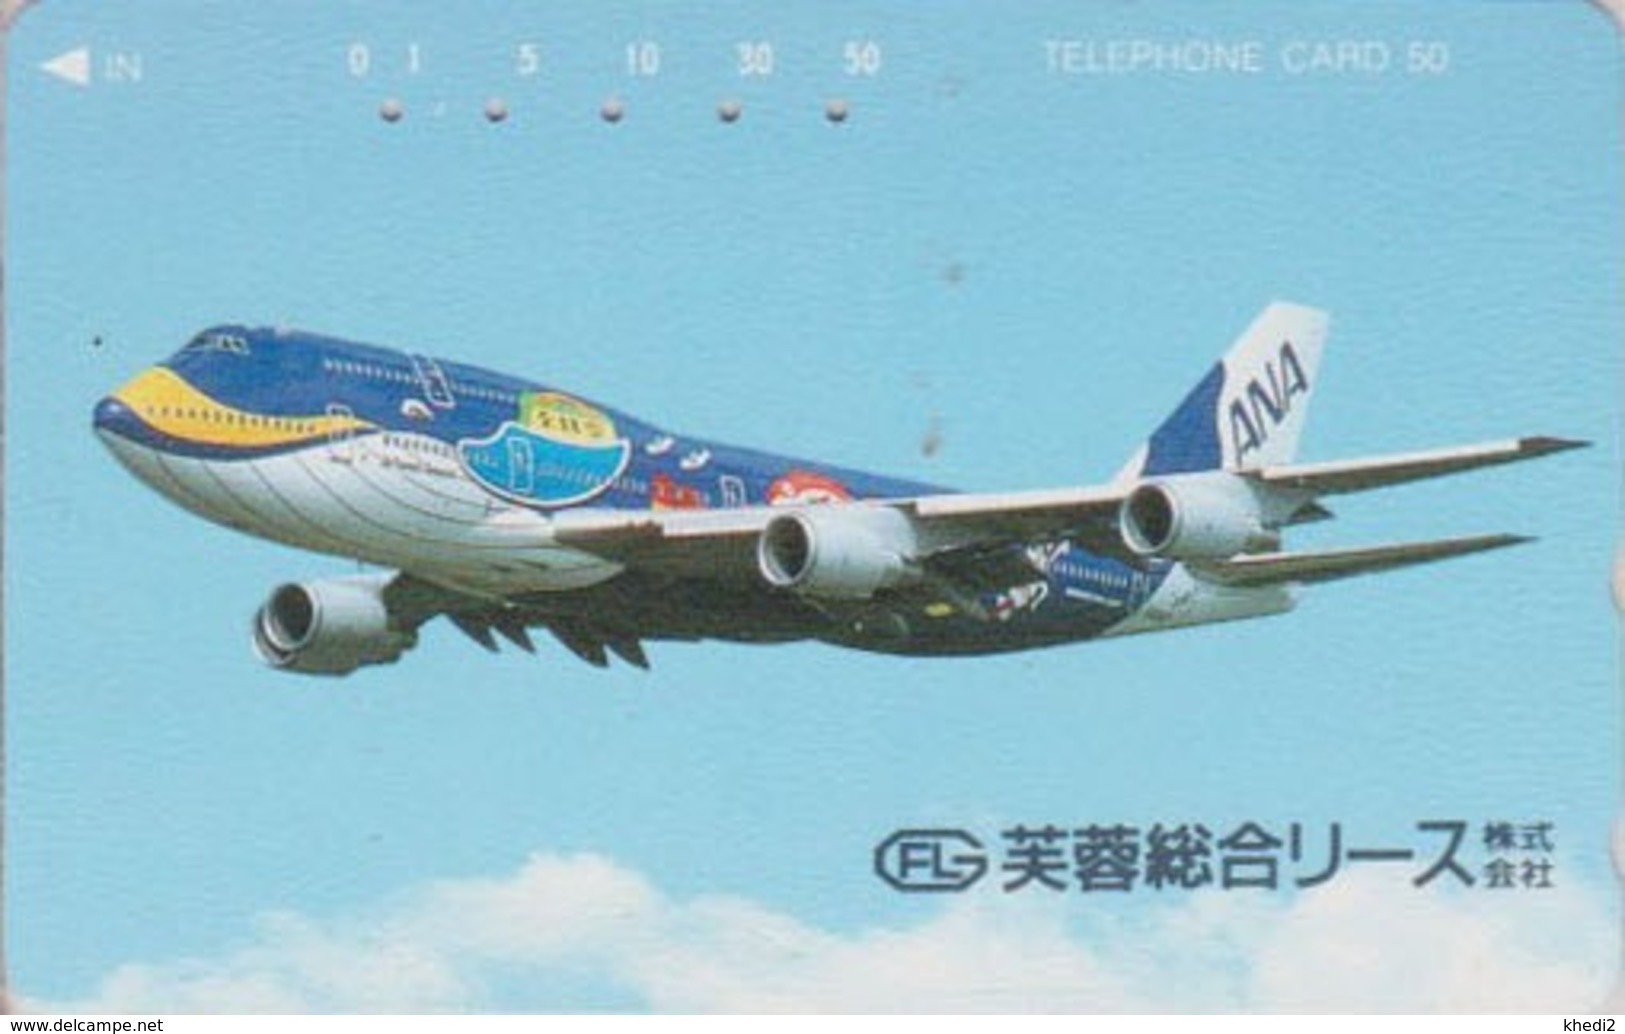 Télécarte Japon / 110-011 - AVION - ANA  ** MARINE JUMBO ** - PLANE Japan Phonecard - Aviation 2302 - Airplanes